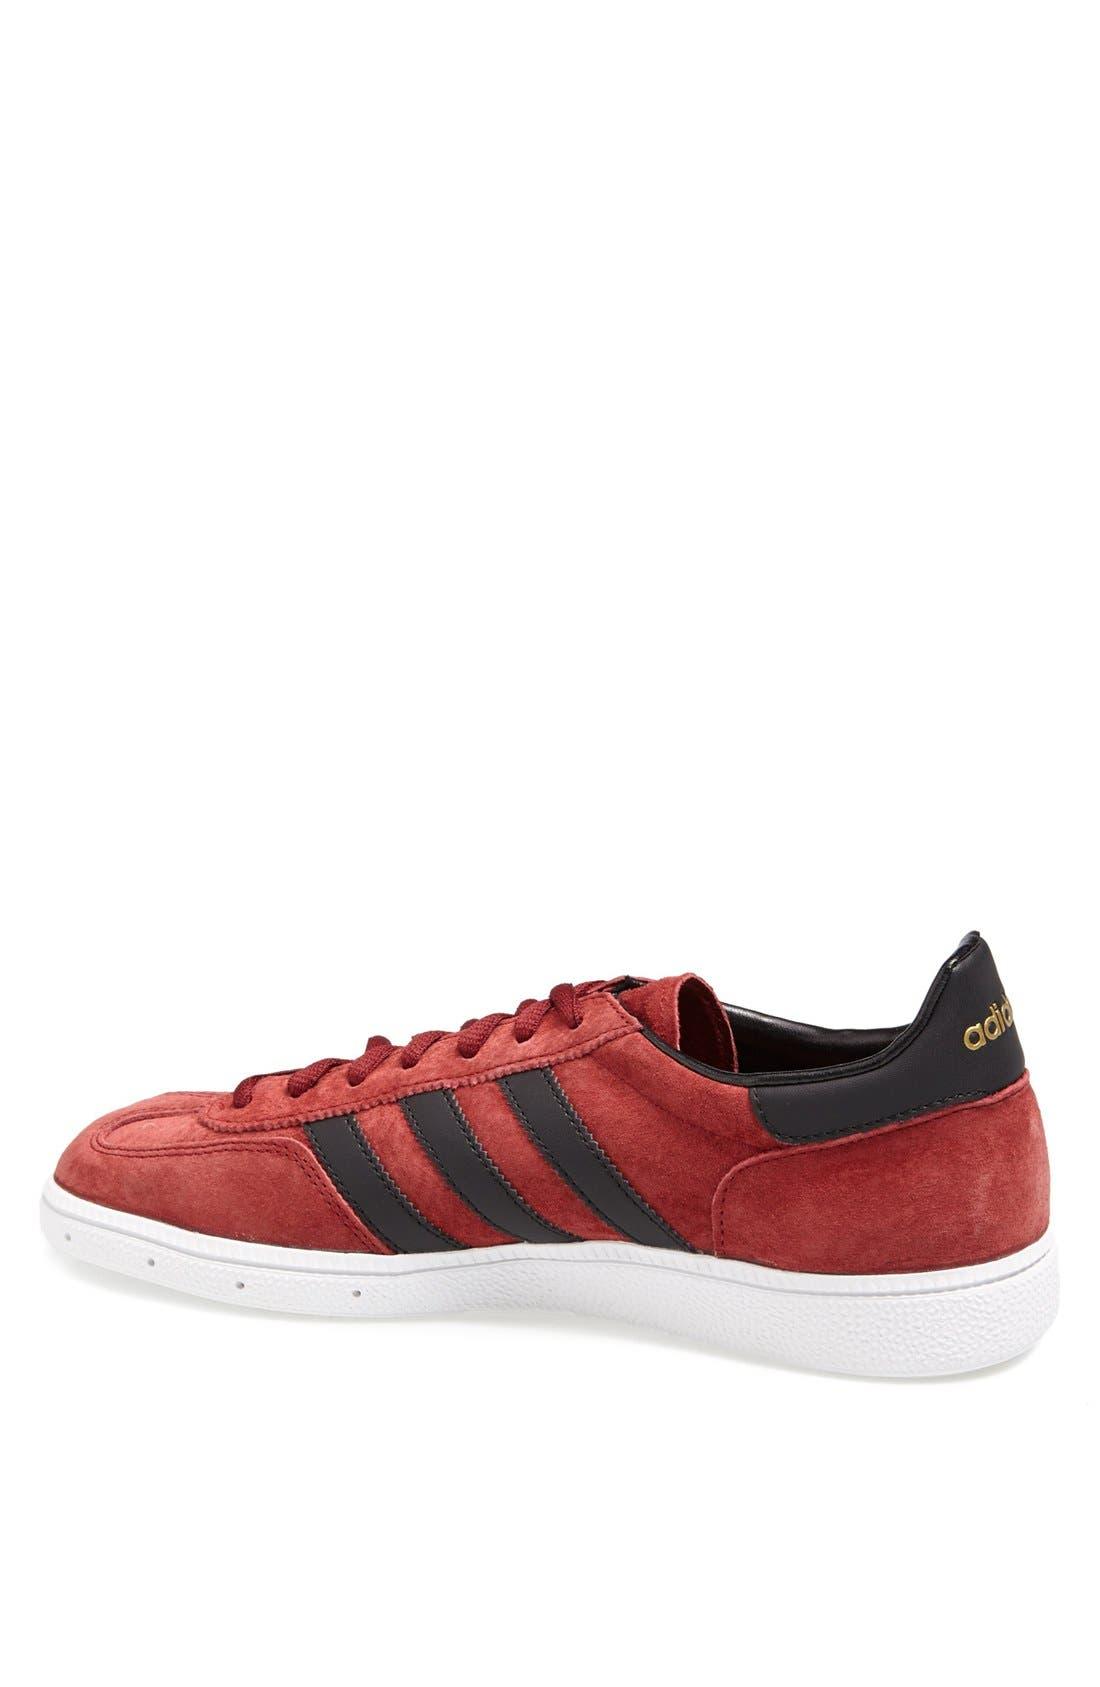 Alternate Image 2  - adidas 'Spezial' Sneaker (Men)